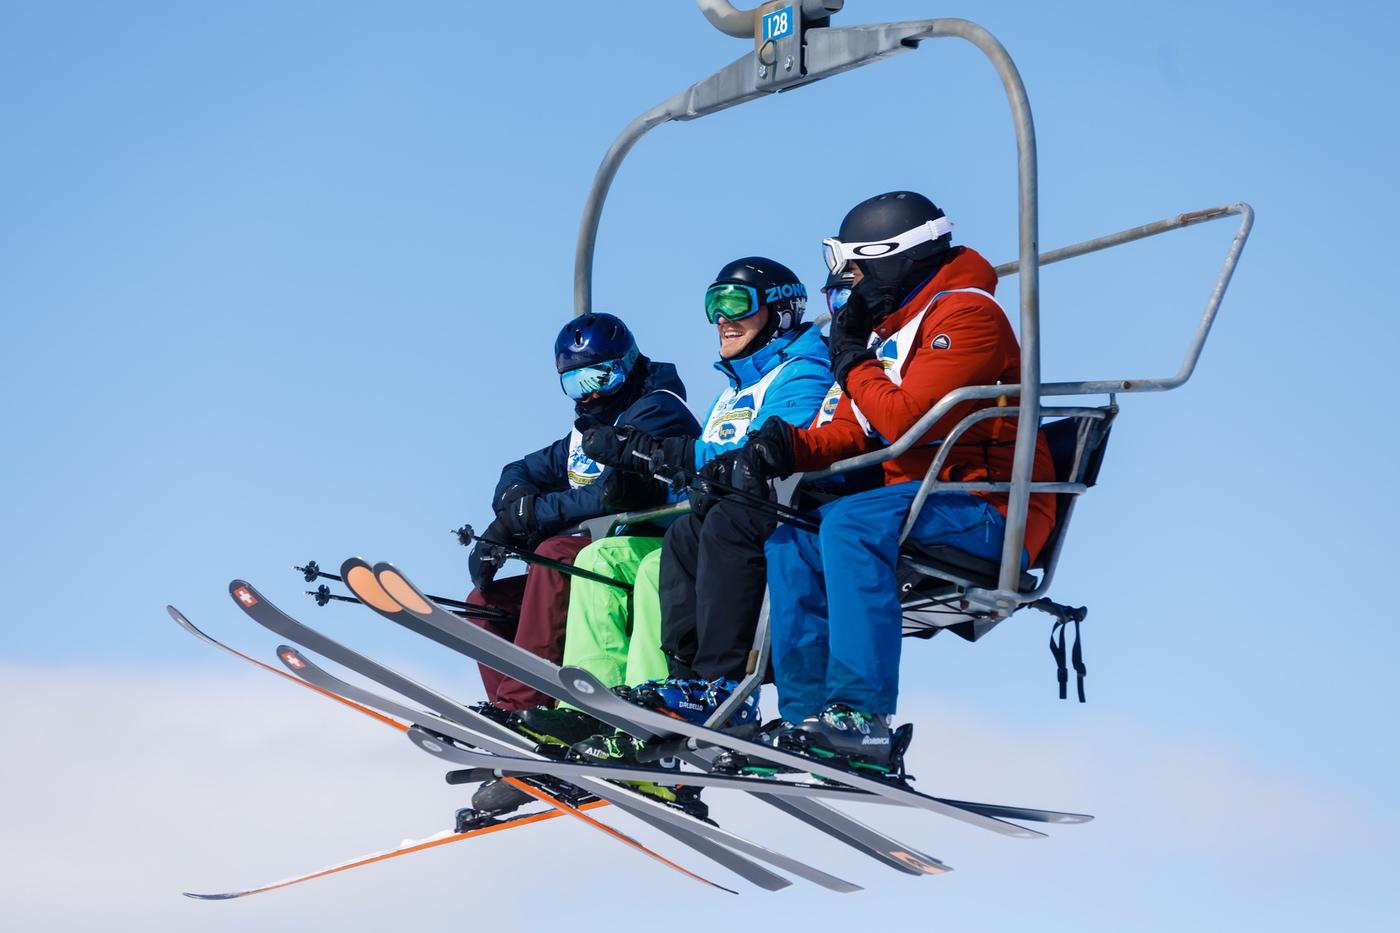 WinterKids Downhill 24 2021 SDP 3201